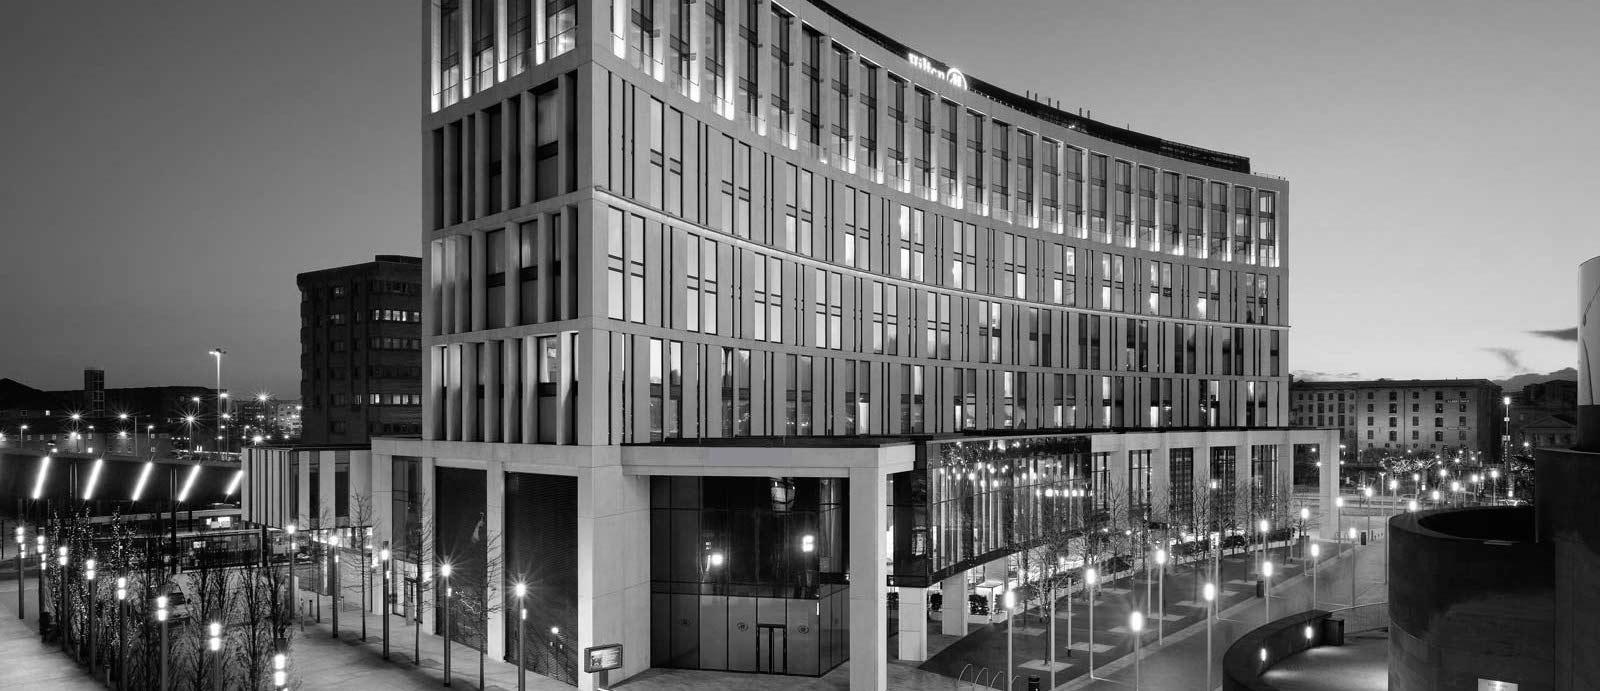 Hilton-Hotel-Liverpool-UK